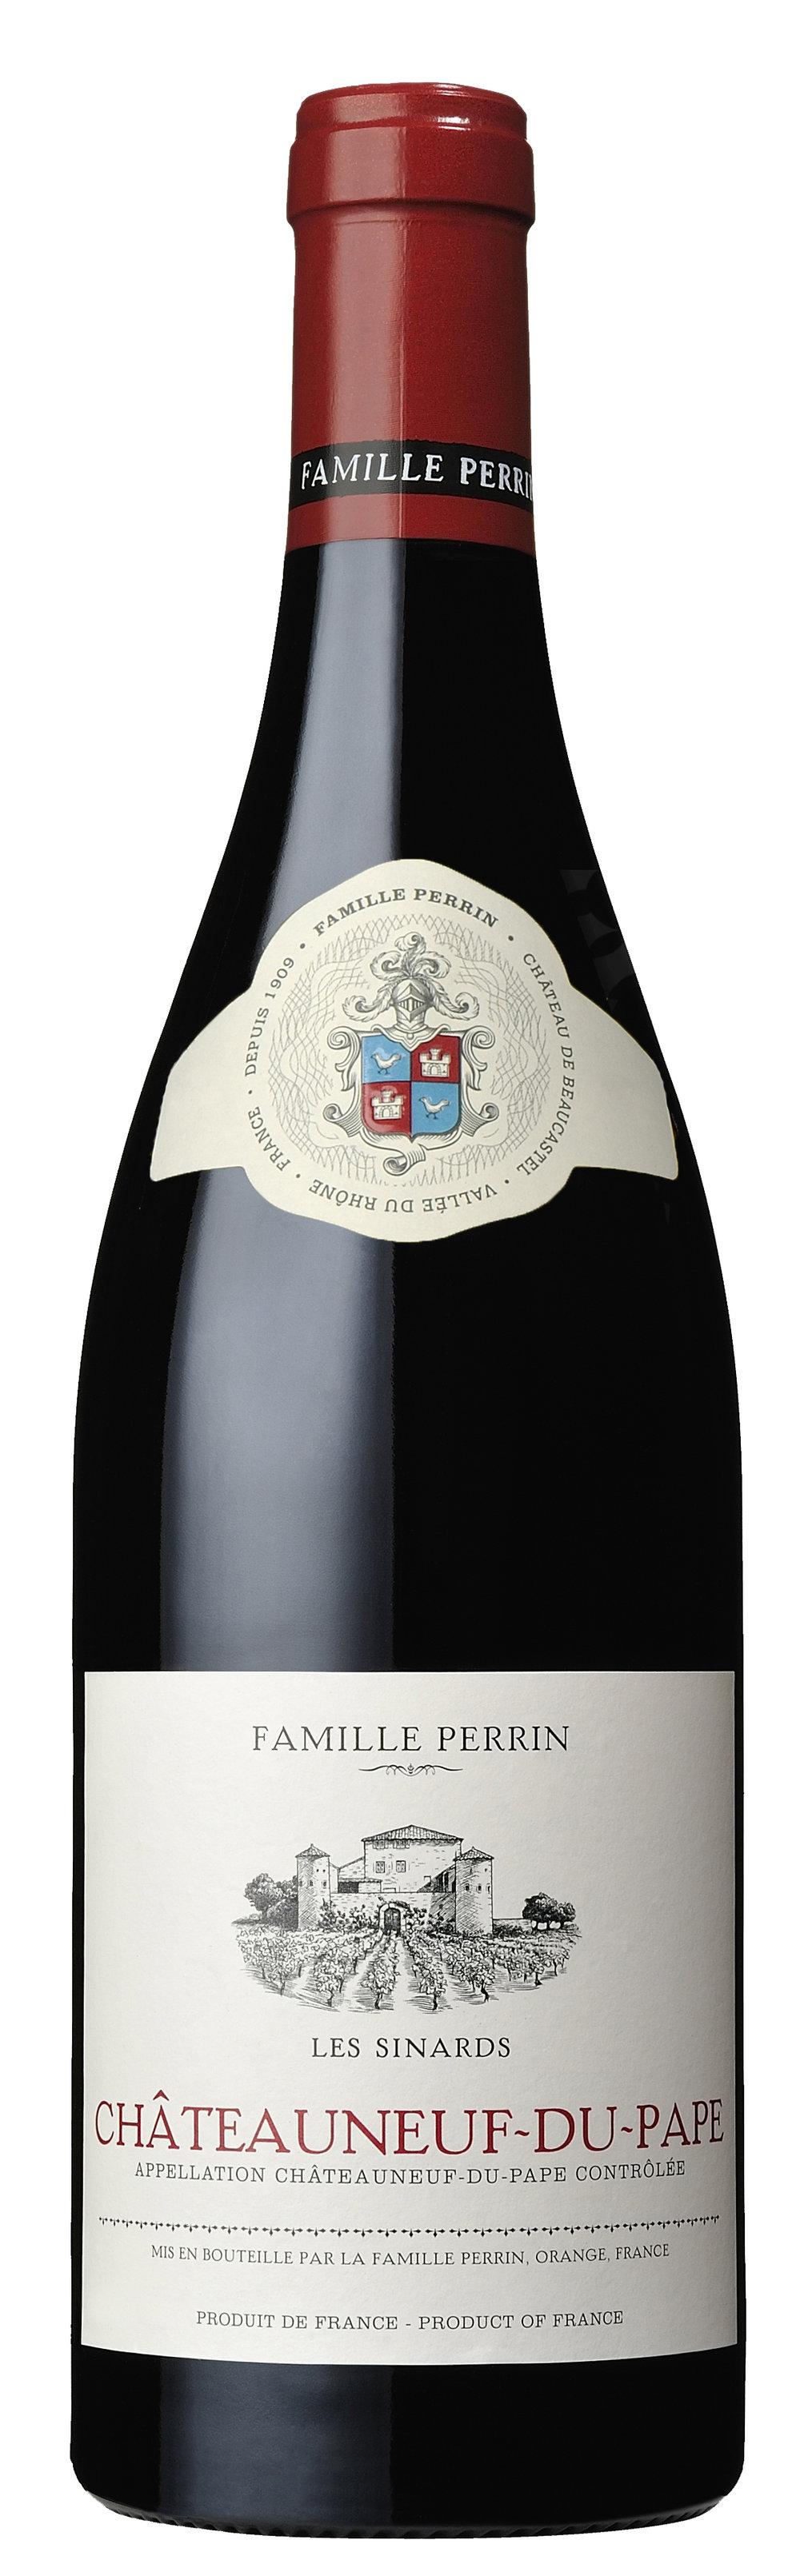 Famille Perrin Châteauneuf-du-Pape Les Sinards Bottle.jpg